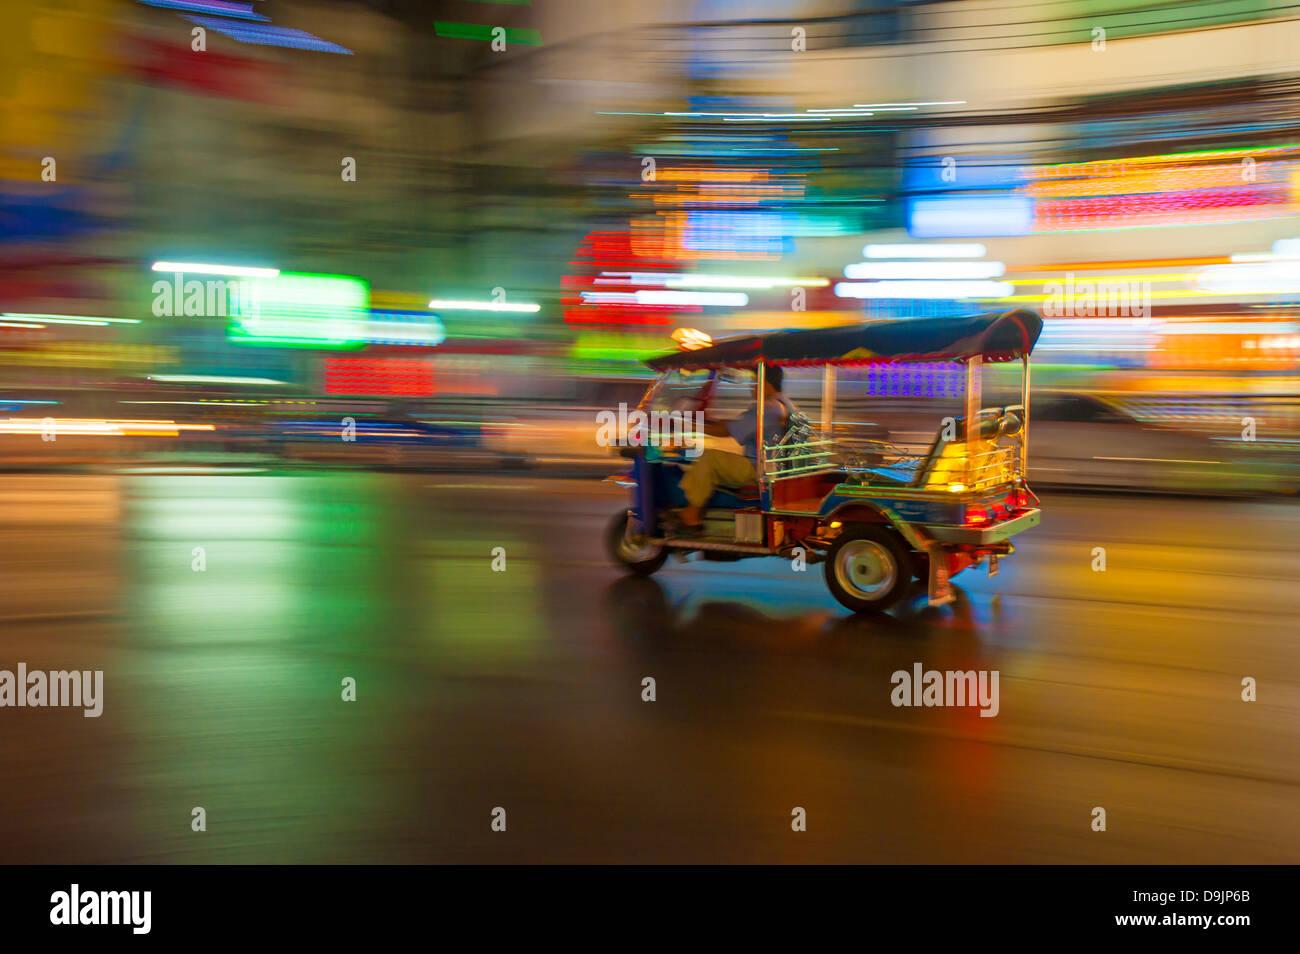 Tuk-tuk in motion blur, Bangkok, Thailandia Immagini Stock